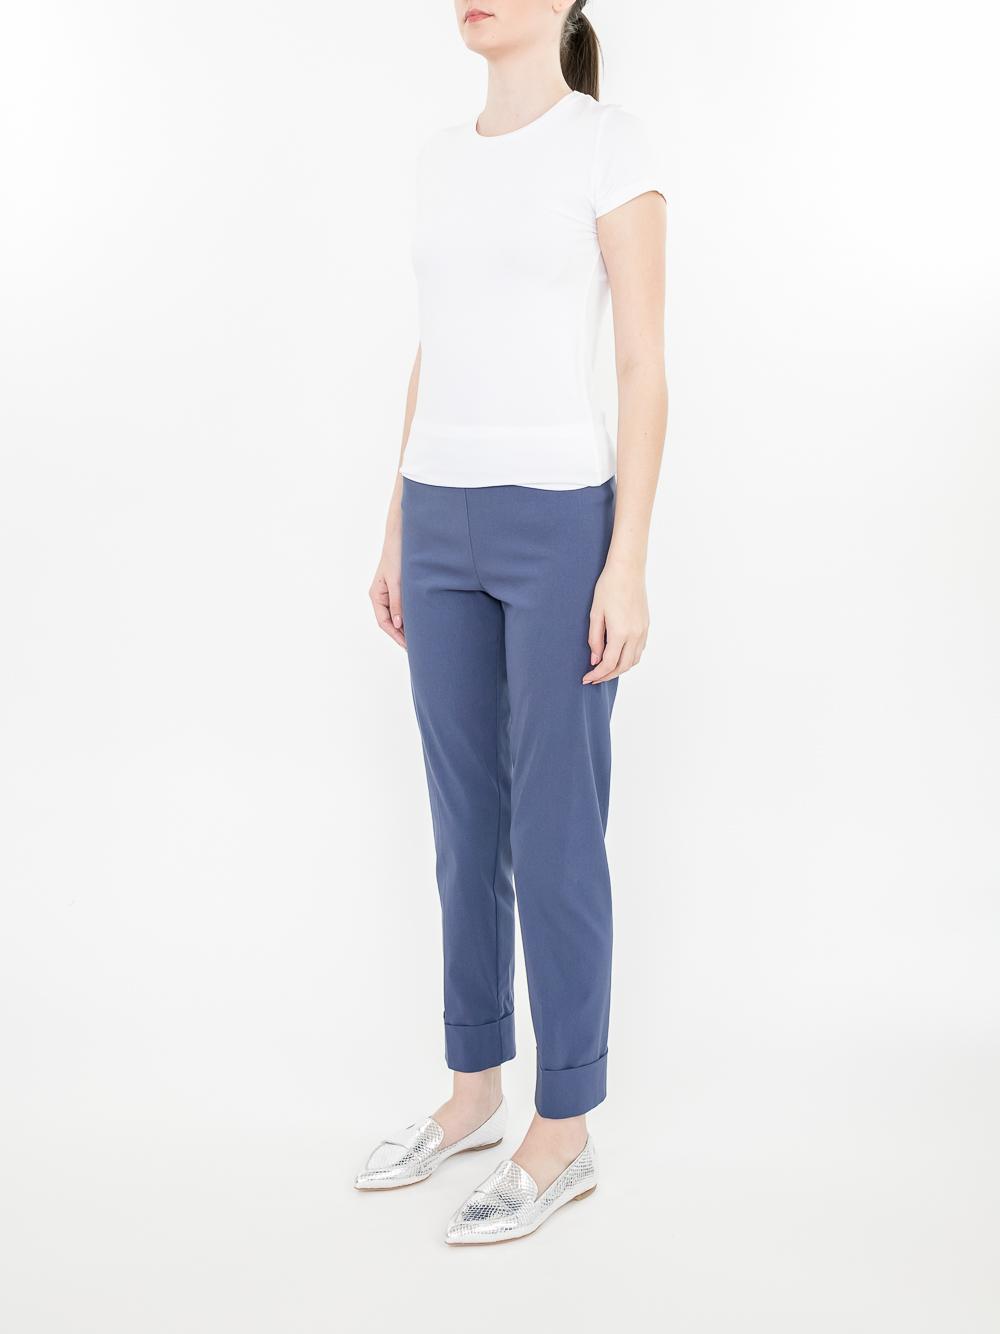 Straight Leg Ankle Cuff Item # FRANCO-F954